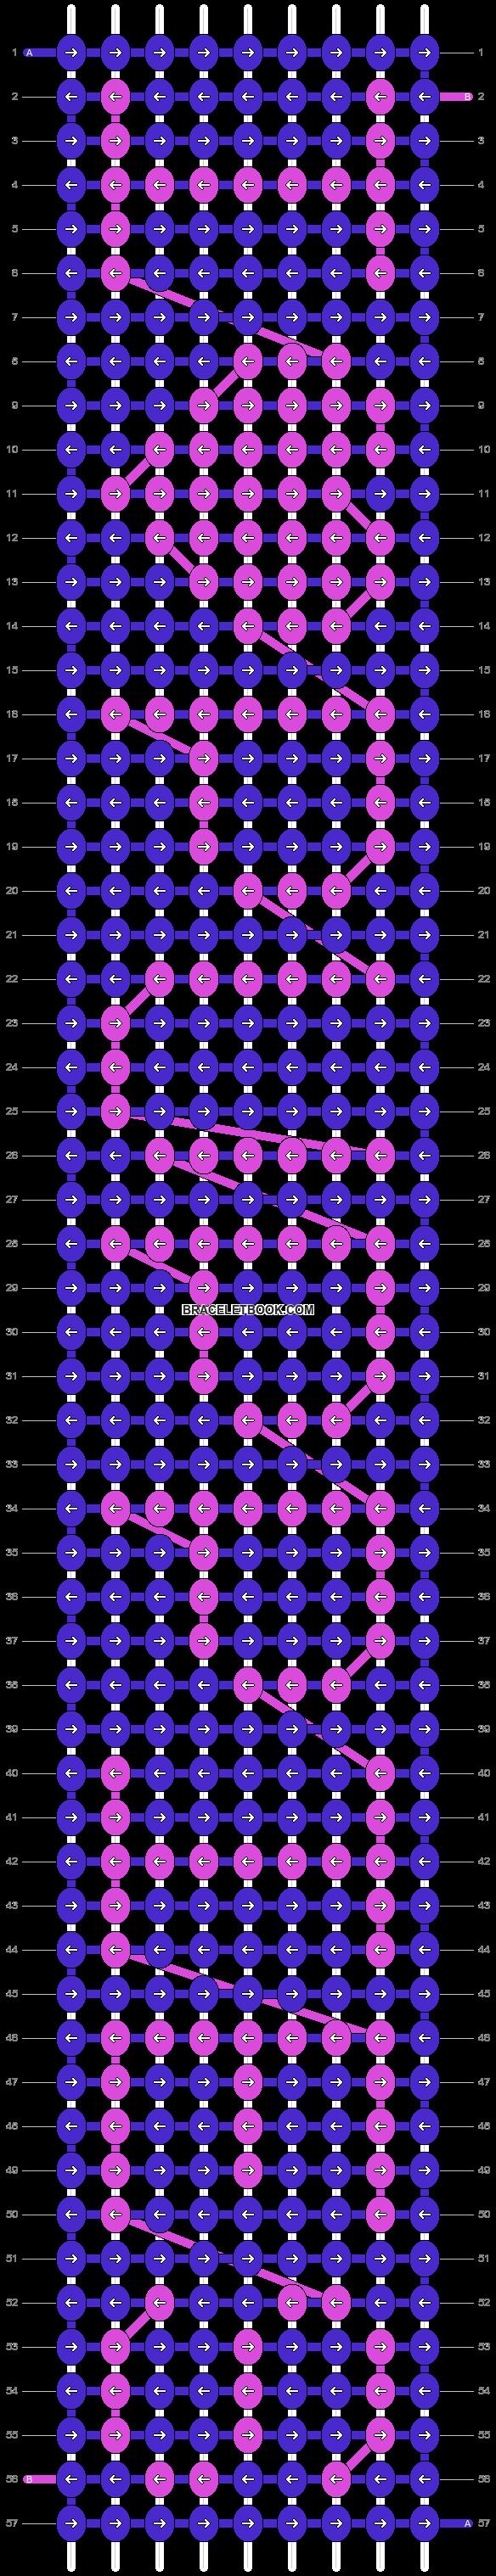 Alpha pattern #3258 pattern